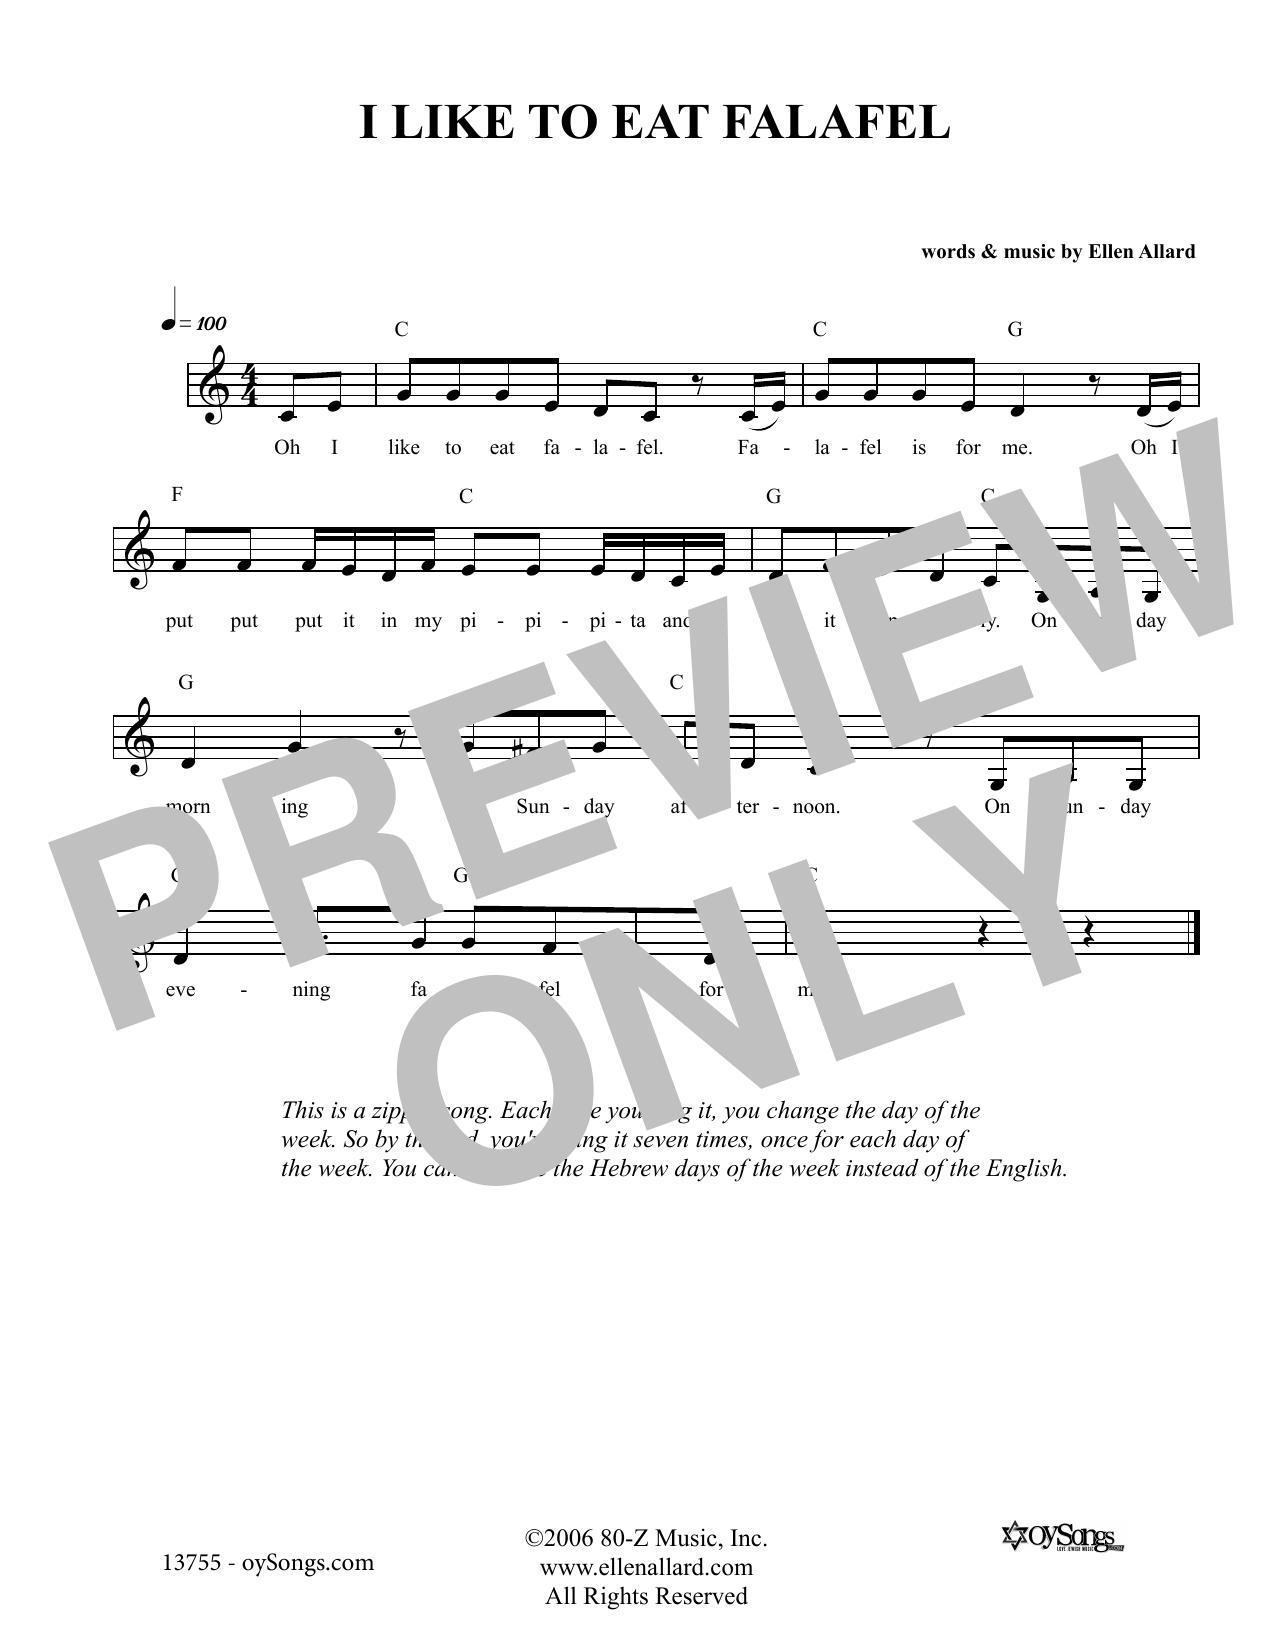 Ellen Allard I Like To Eat Felafel sheet music notes and chords. Download Printable PDF.